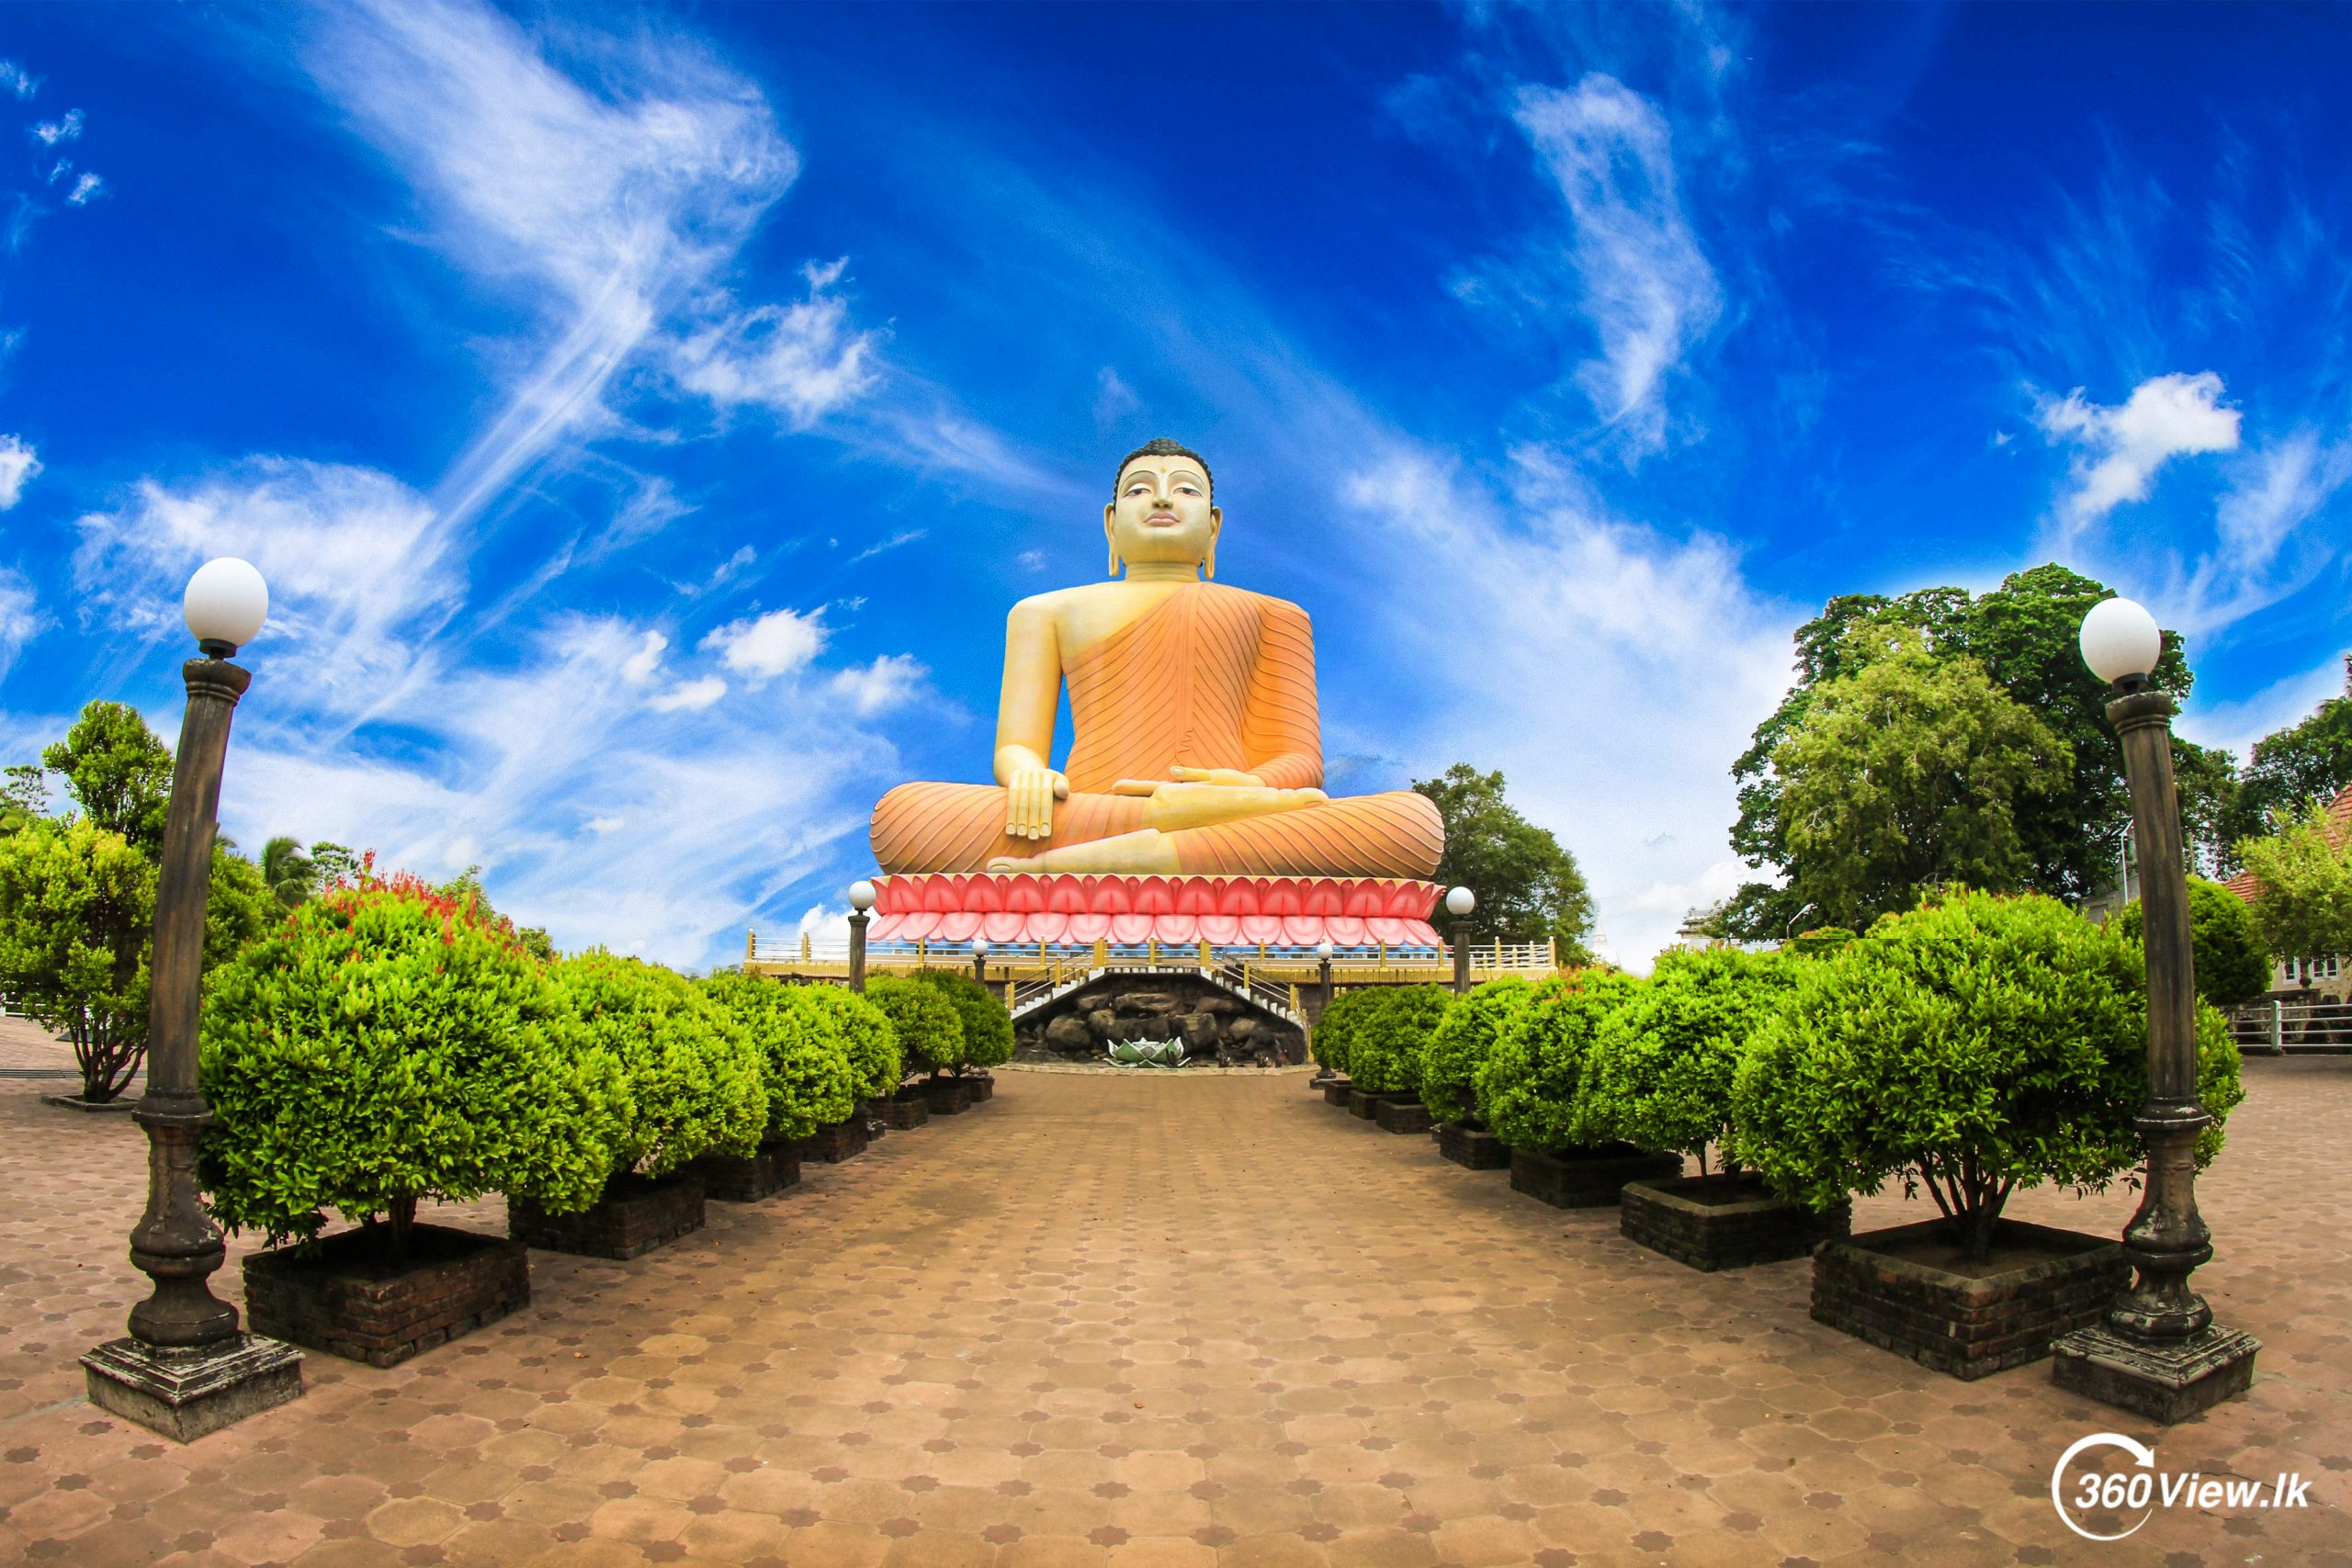 Alutgama Kande Viharaya Temple